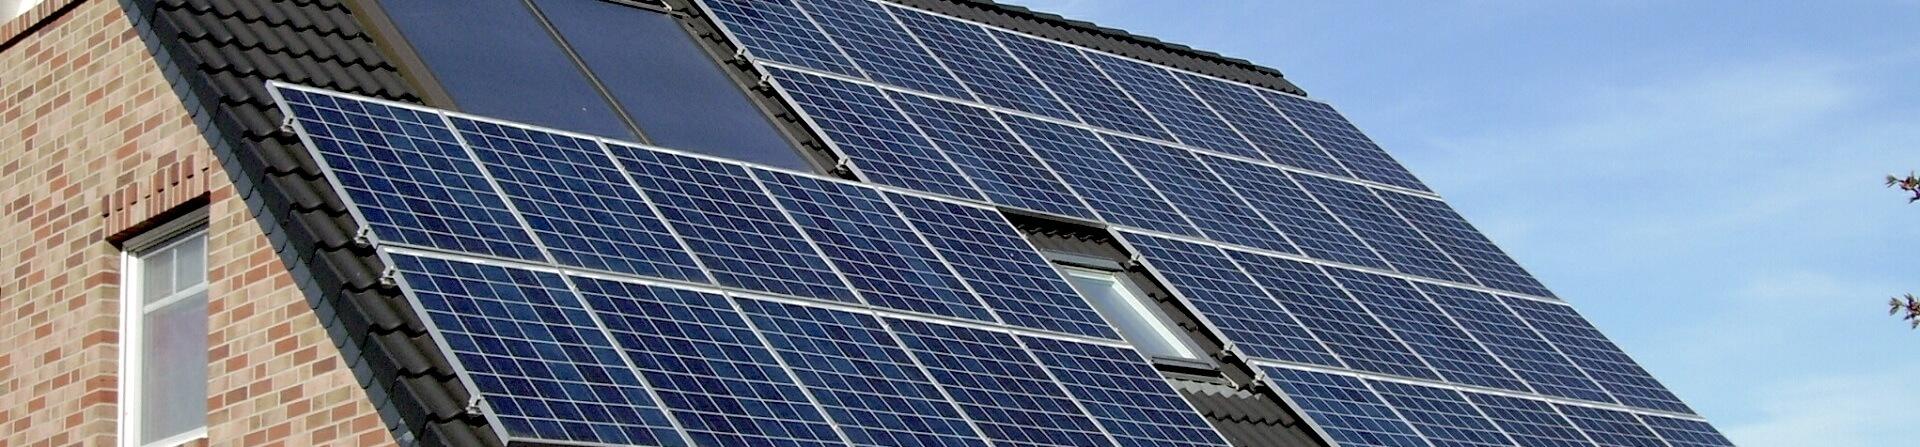 Solarpanel Energiesparen Strom